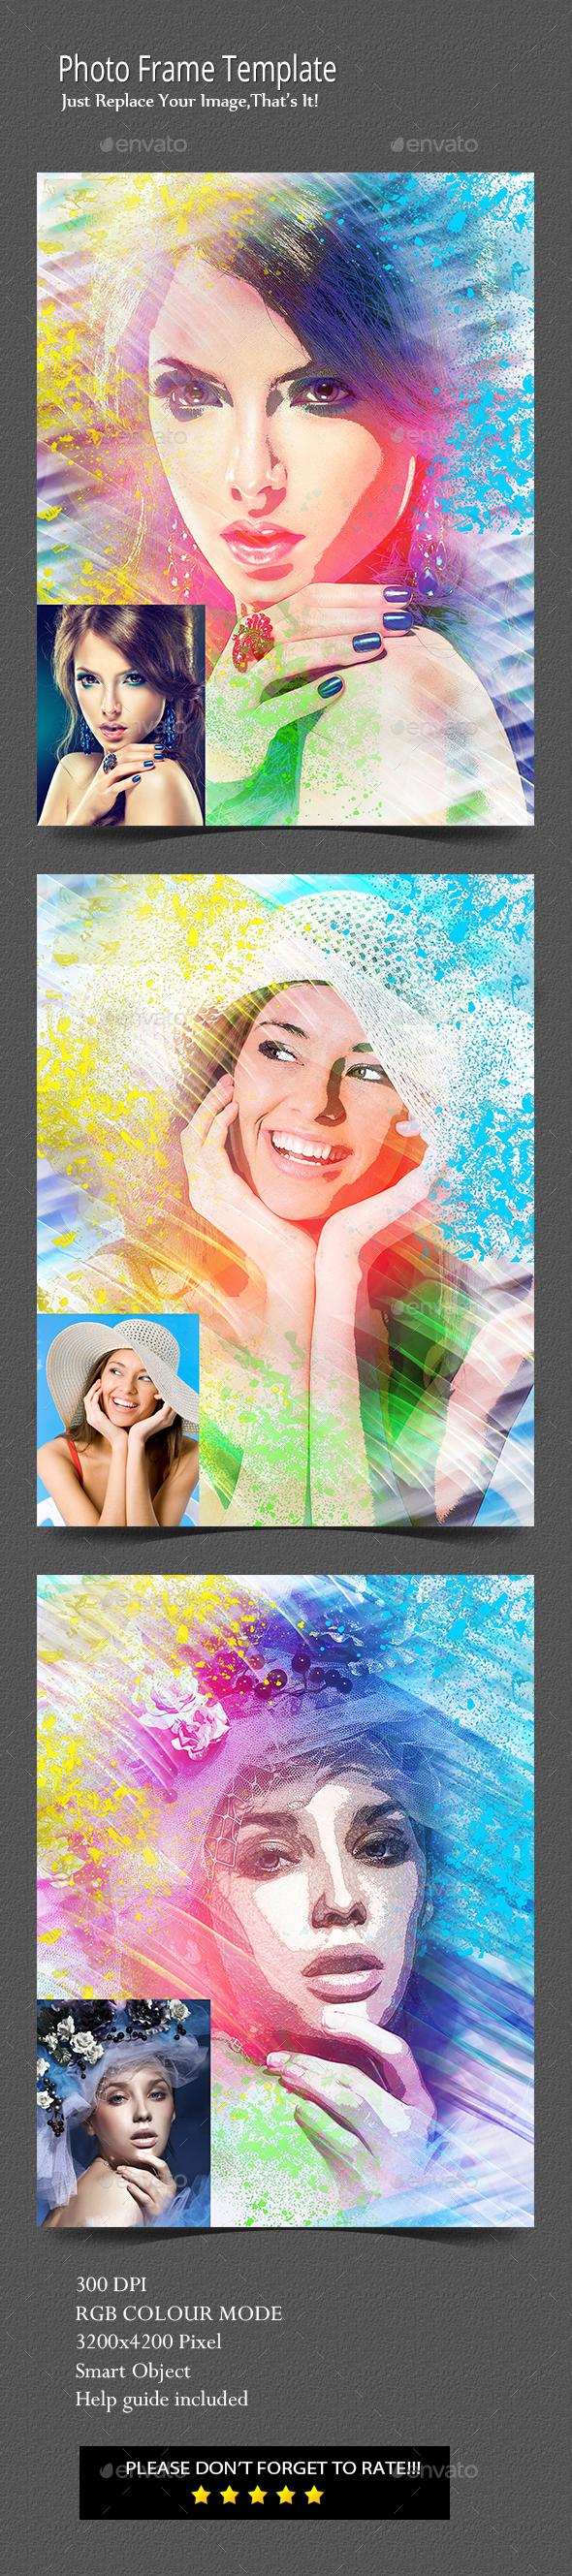 Artiatic Photo Template - Photo Templates Graphics